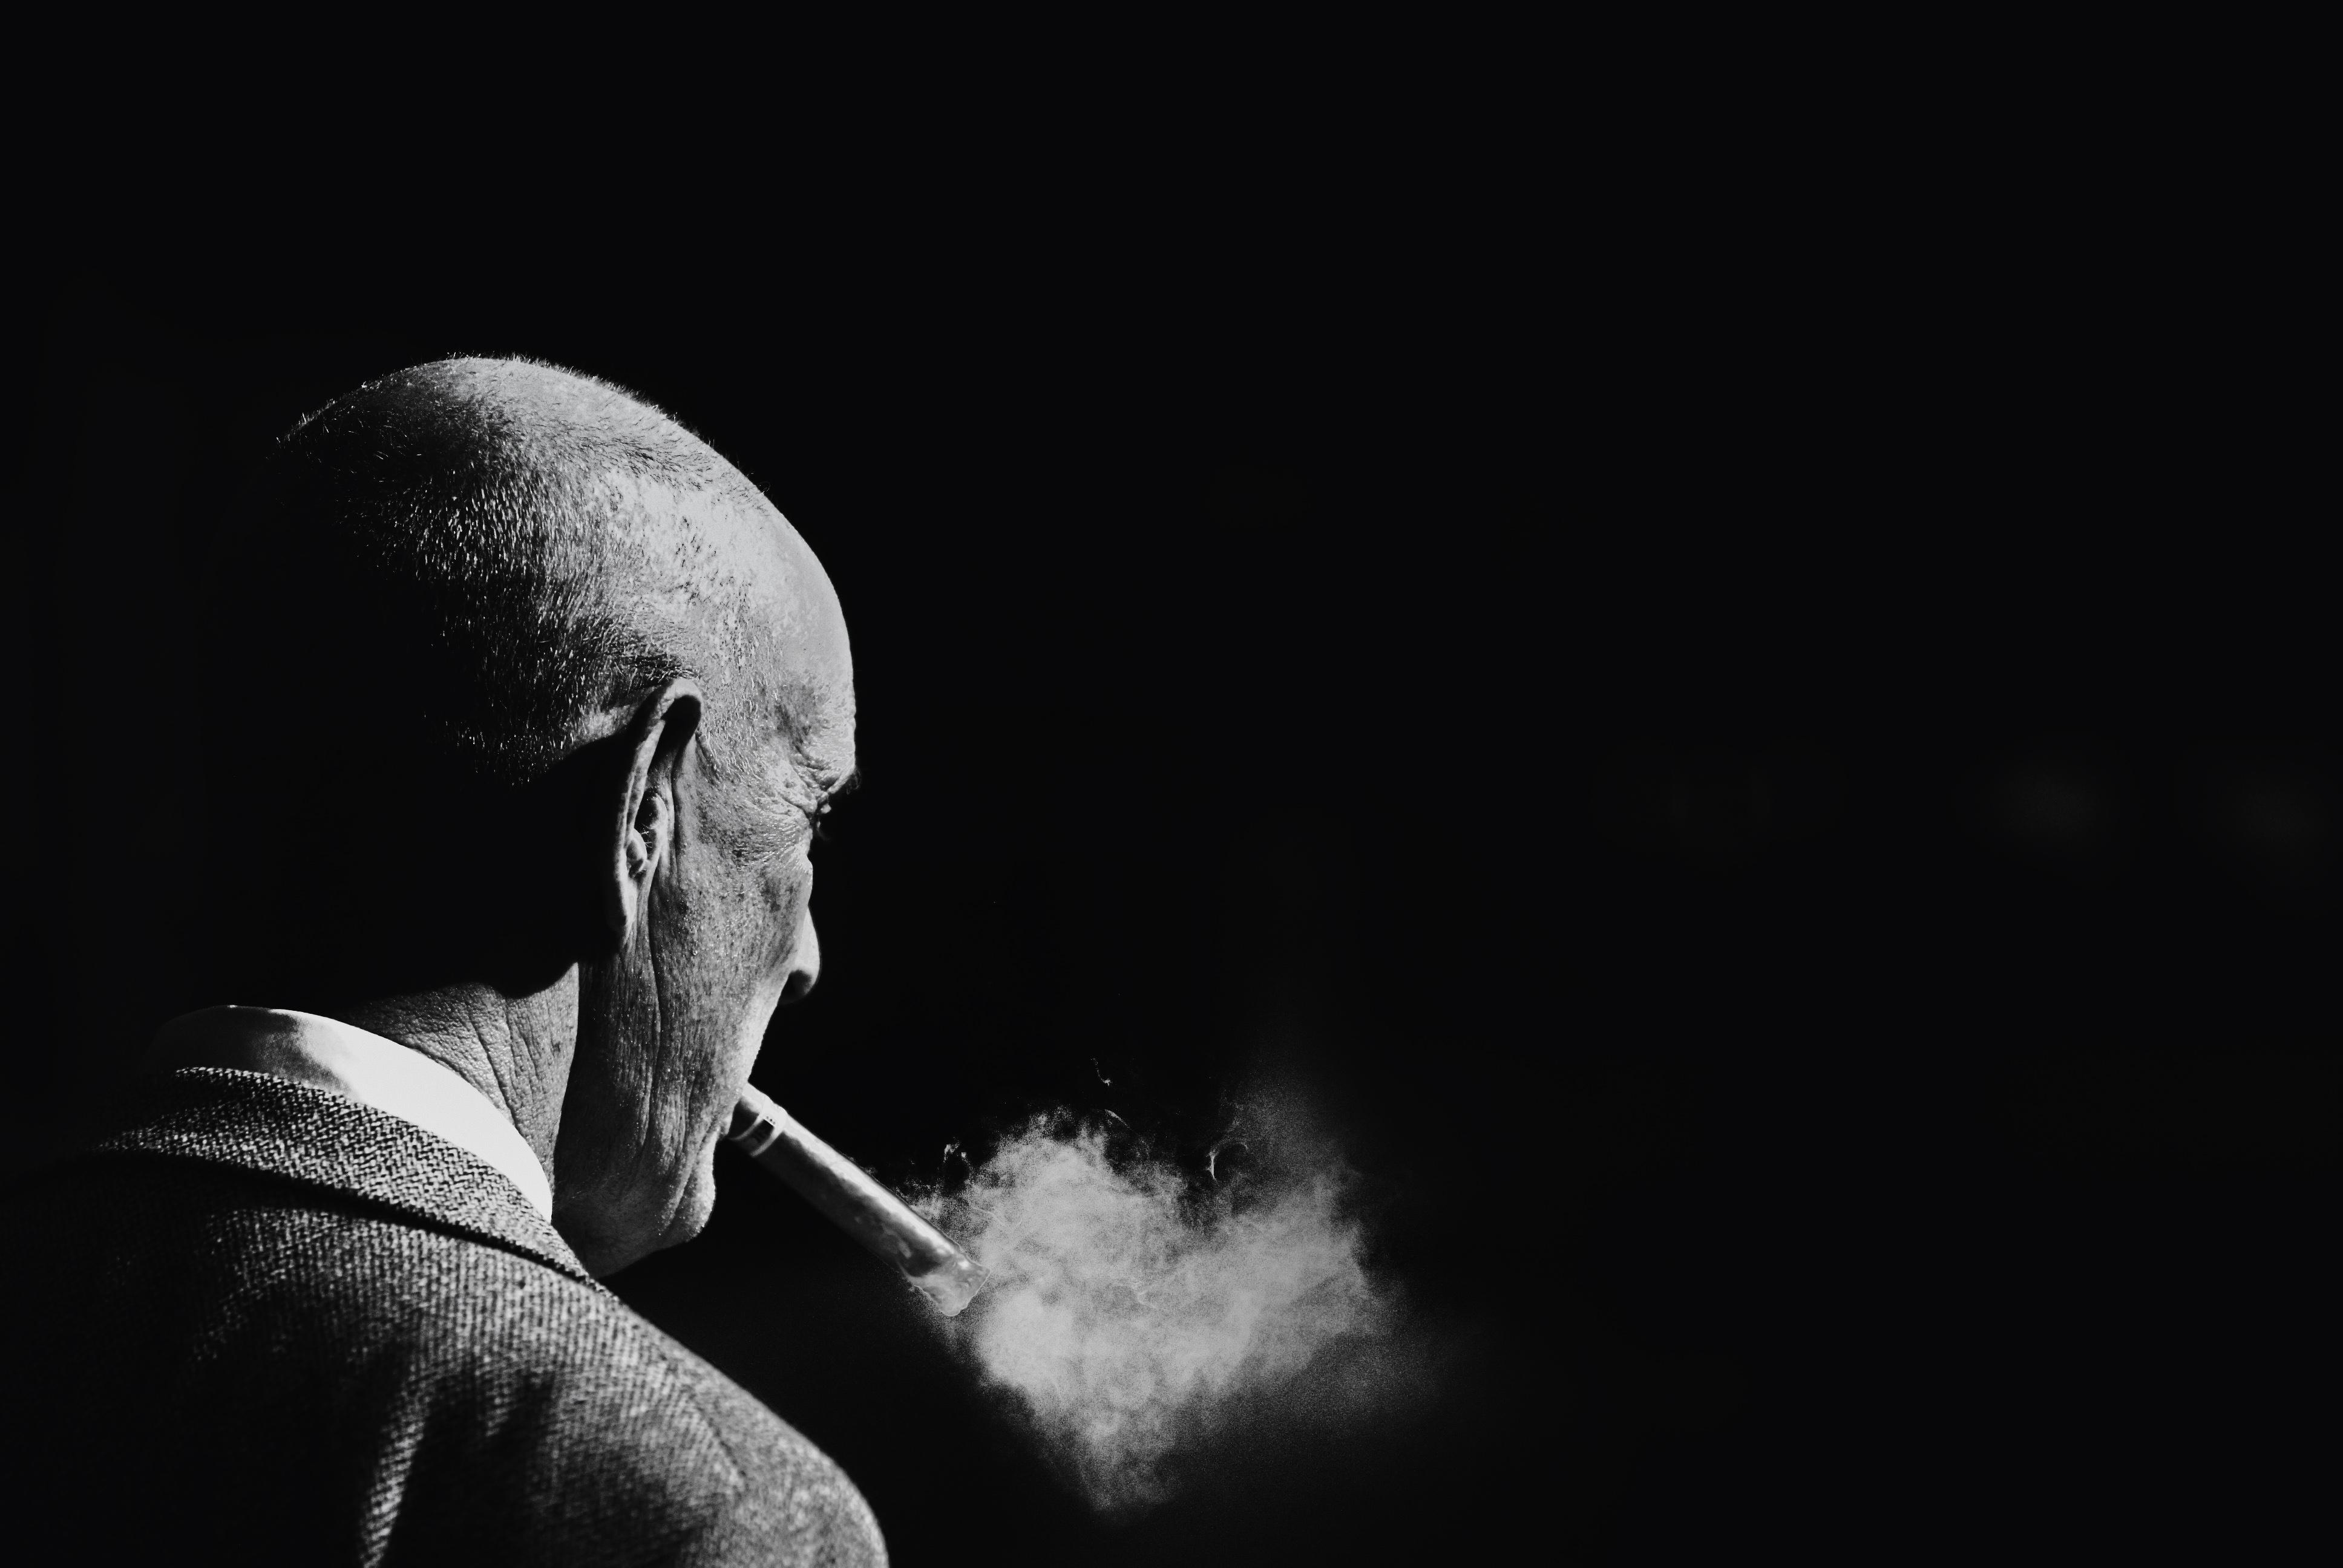 Black Monochrome Street Sky Photography Smoke Bw Man Darkness Highcontrast Telaviv Cigar Puff Computer Wallpaper